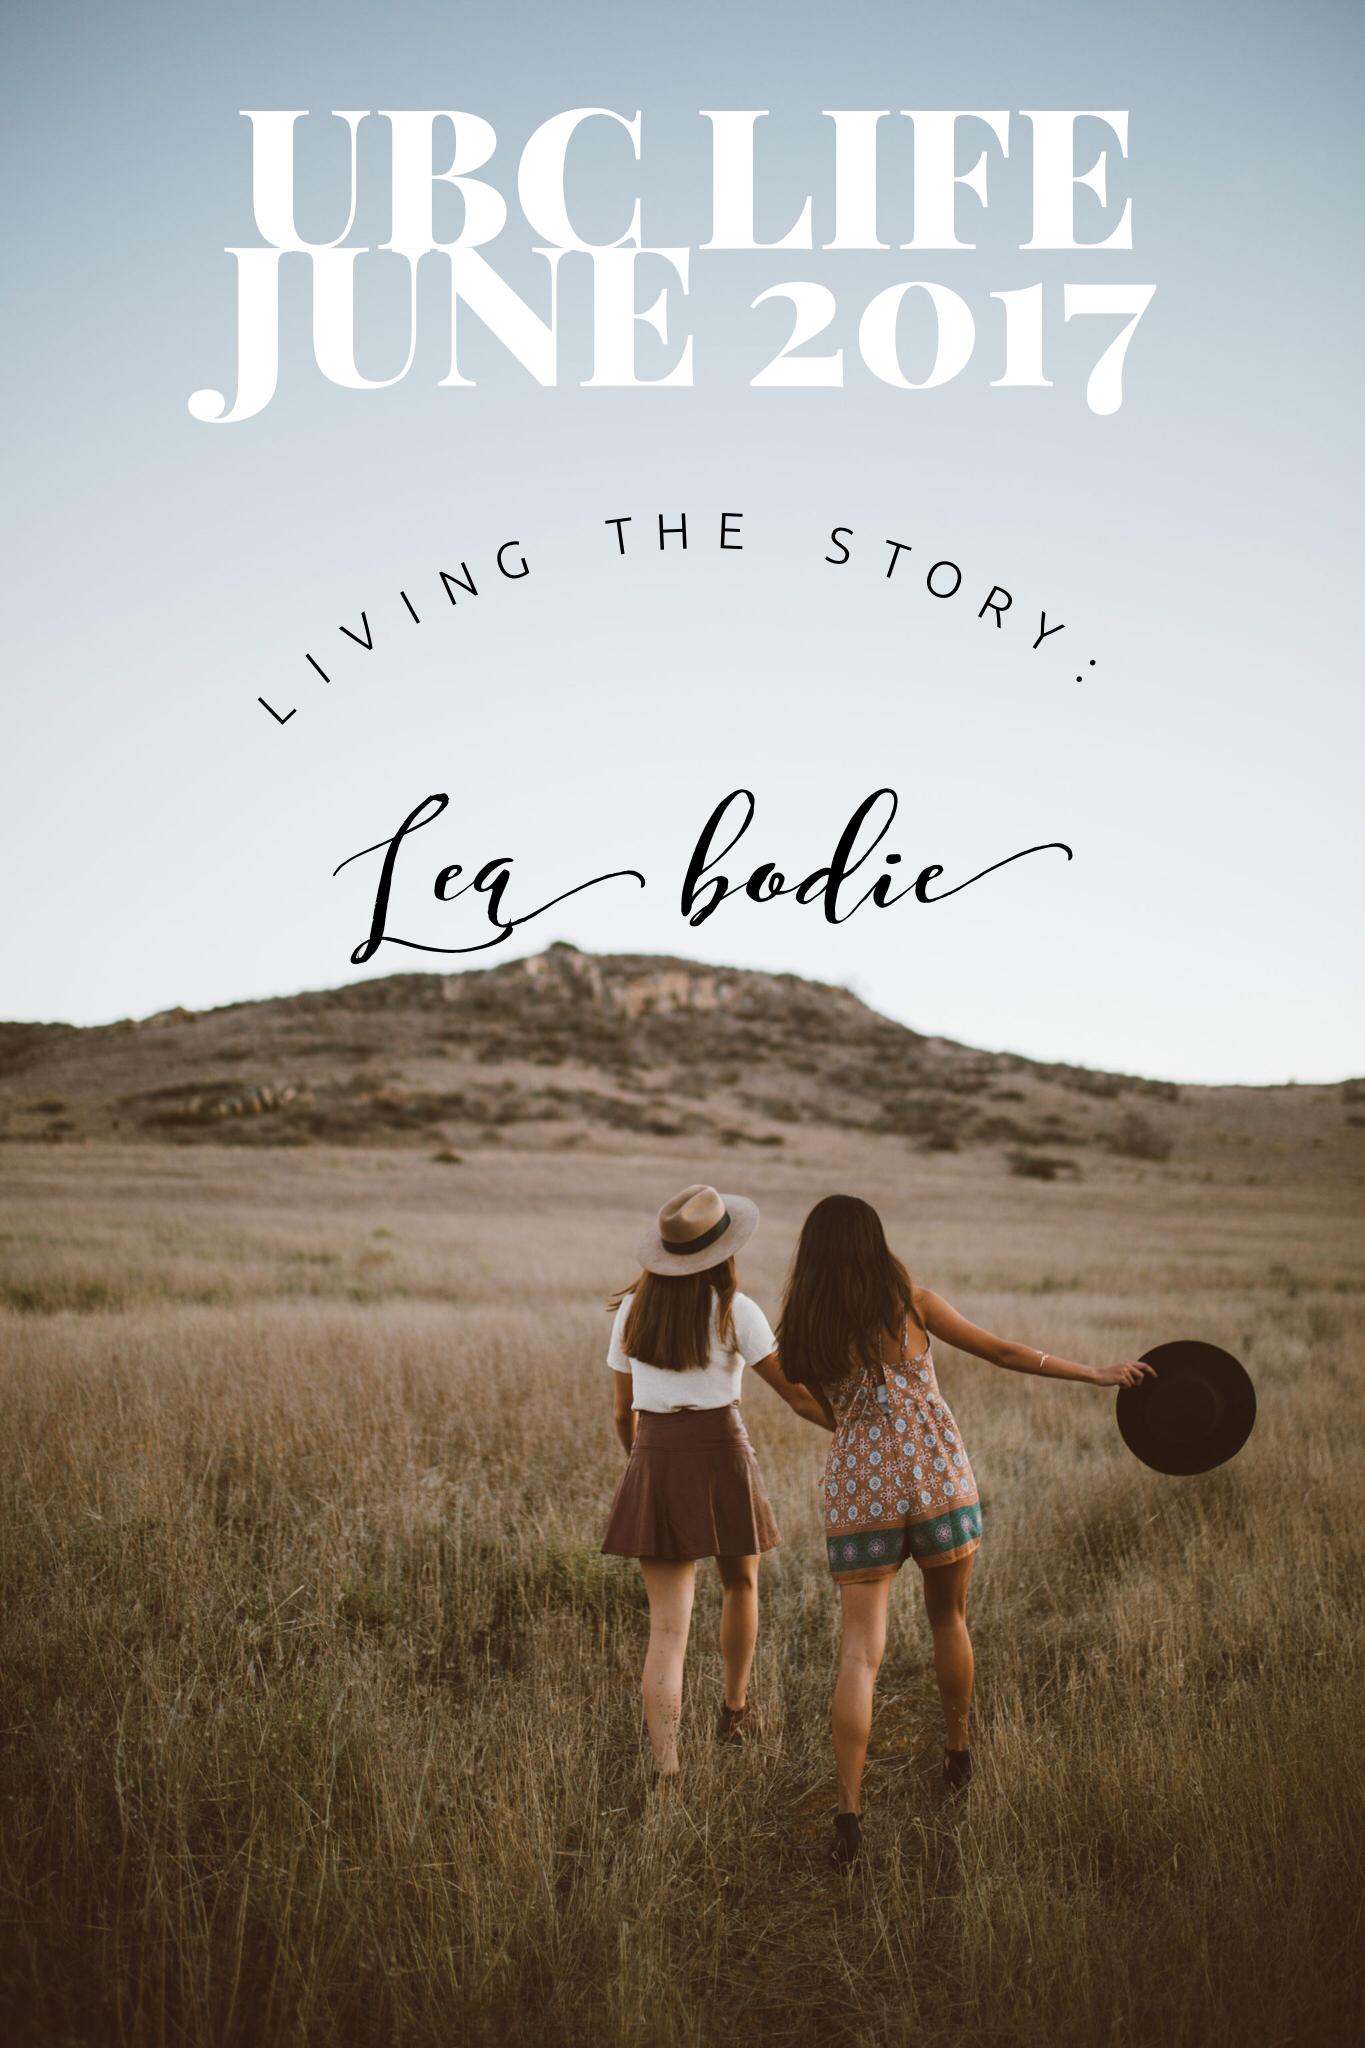 UBC Life - Living The Story